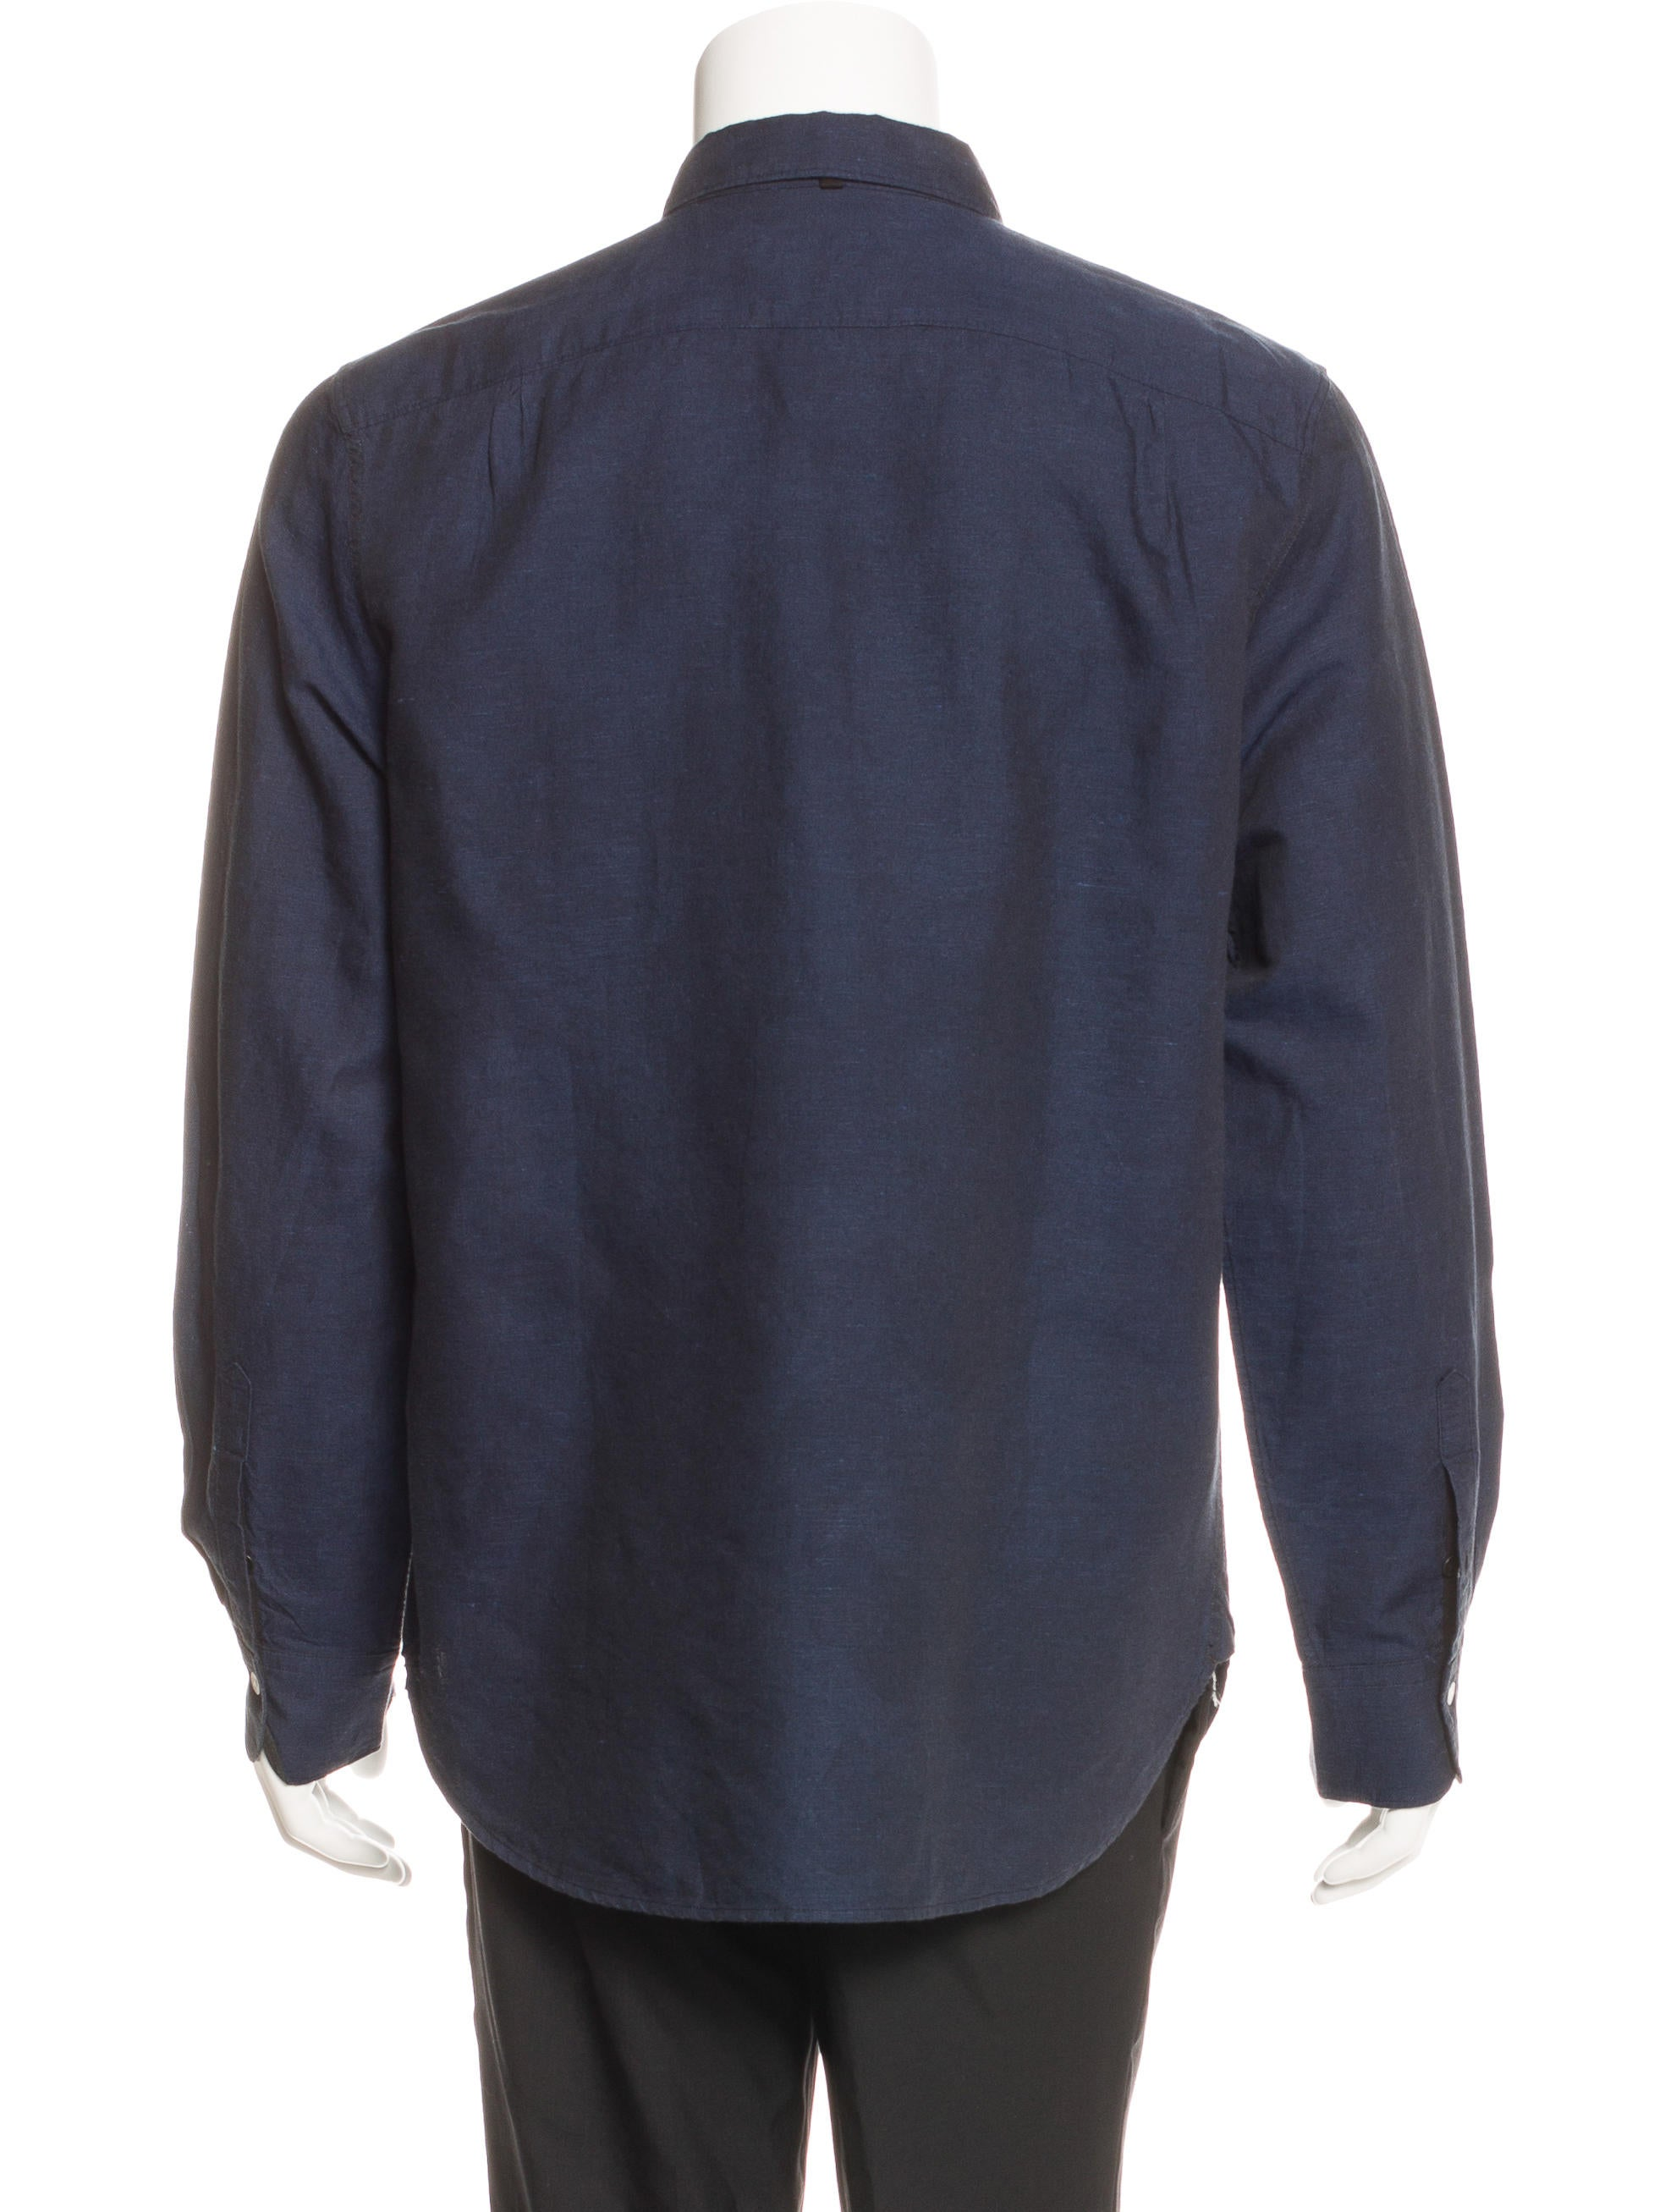 Rag Bone Classic Fit Linen Blend Shirt Clothing